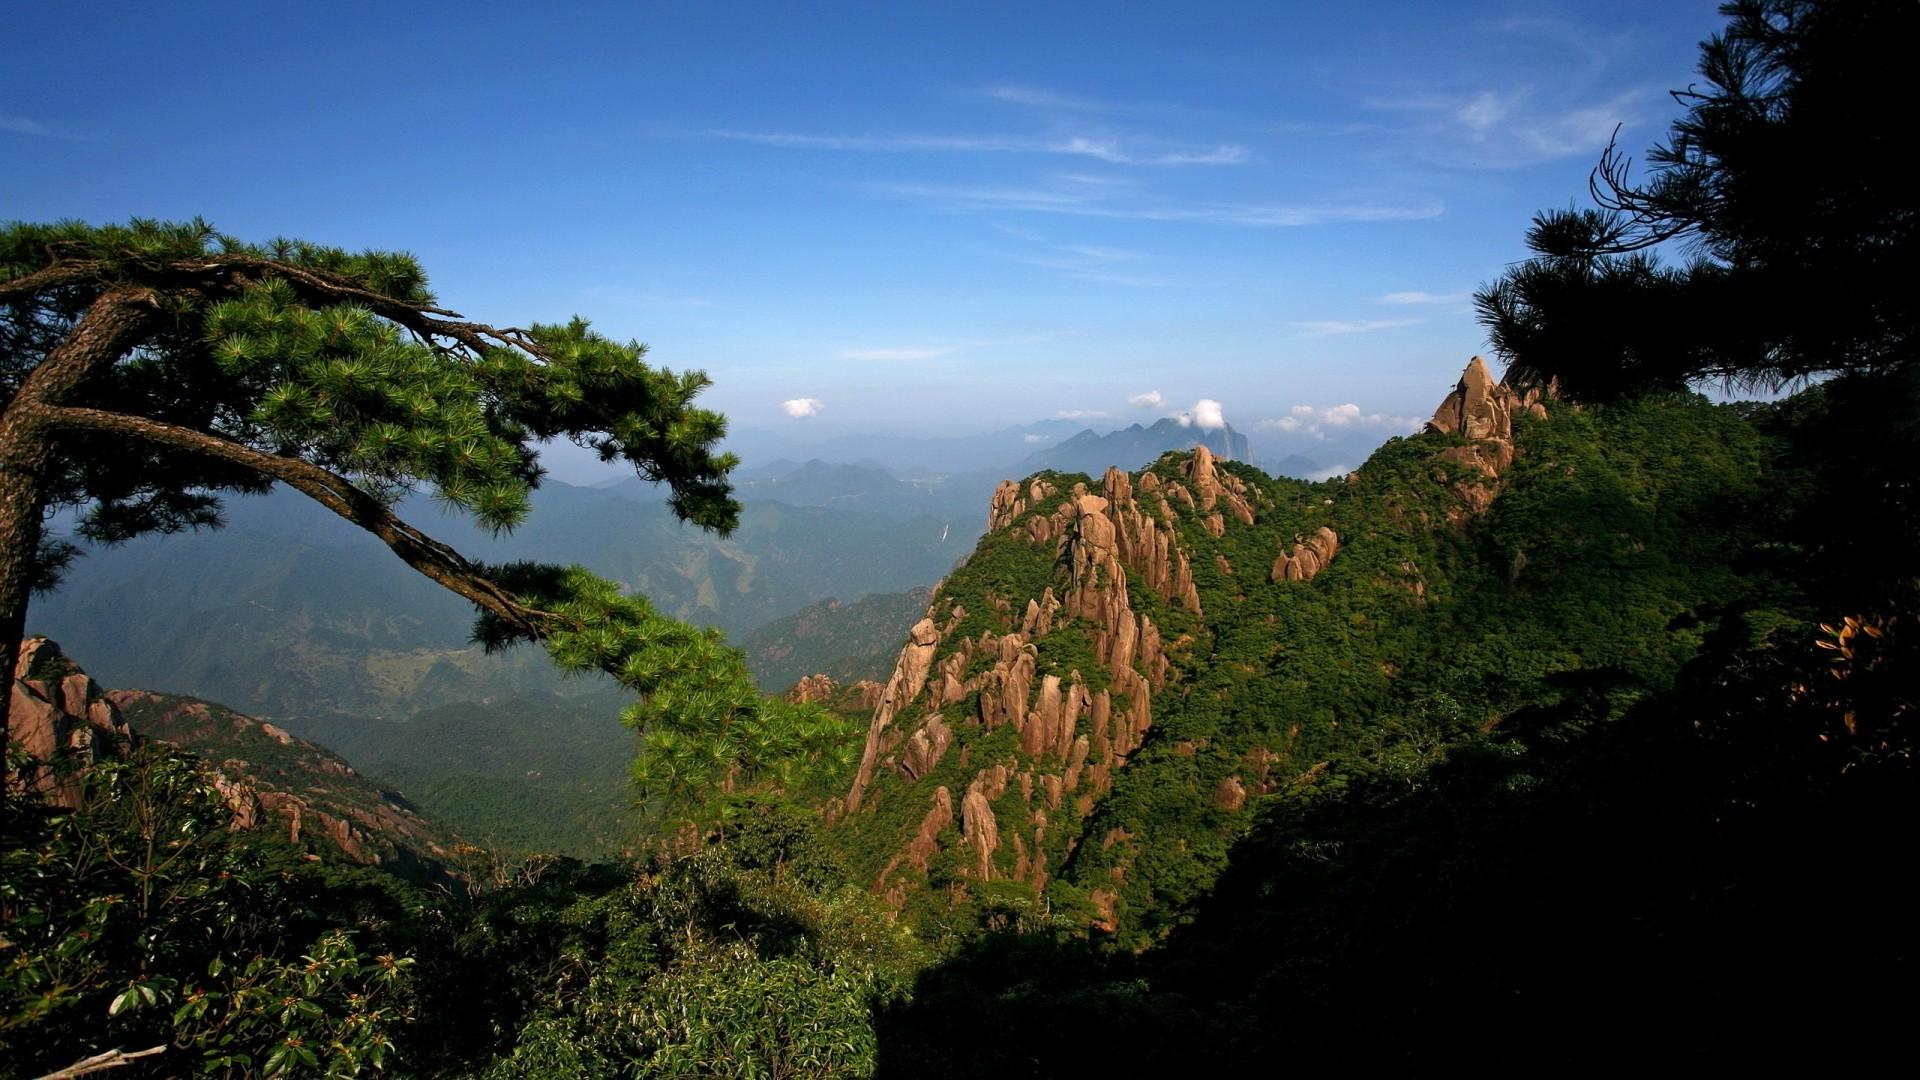 Fall Mountains Hd Desktop Wallpaper Download Jungle Hd Backgrounds Free Pixelstalk Net